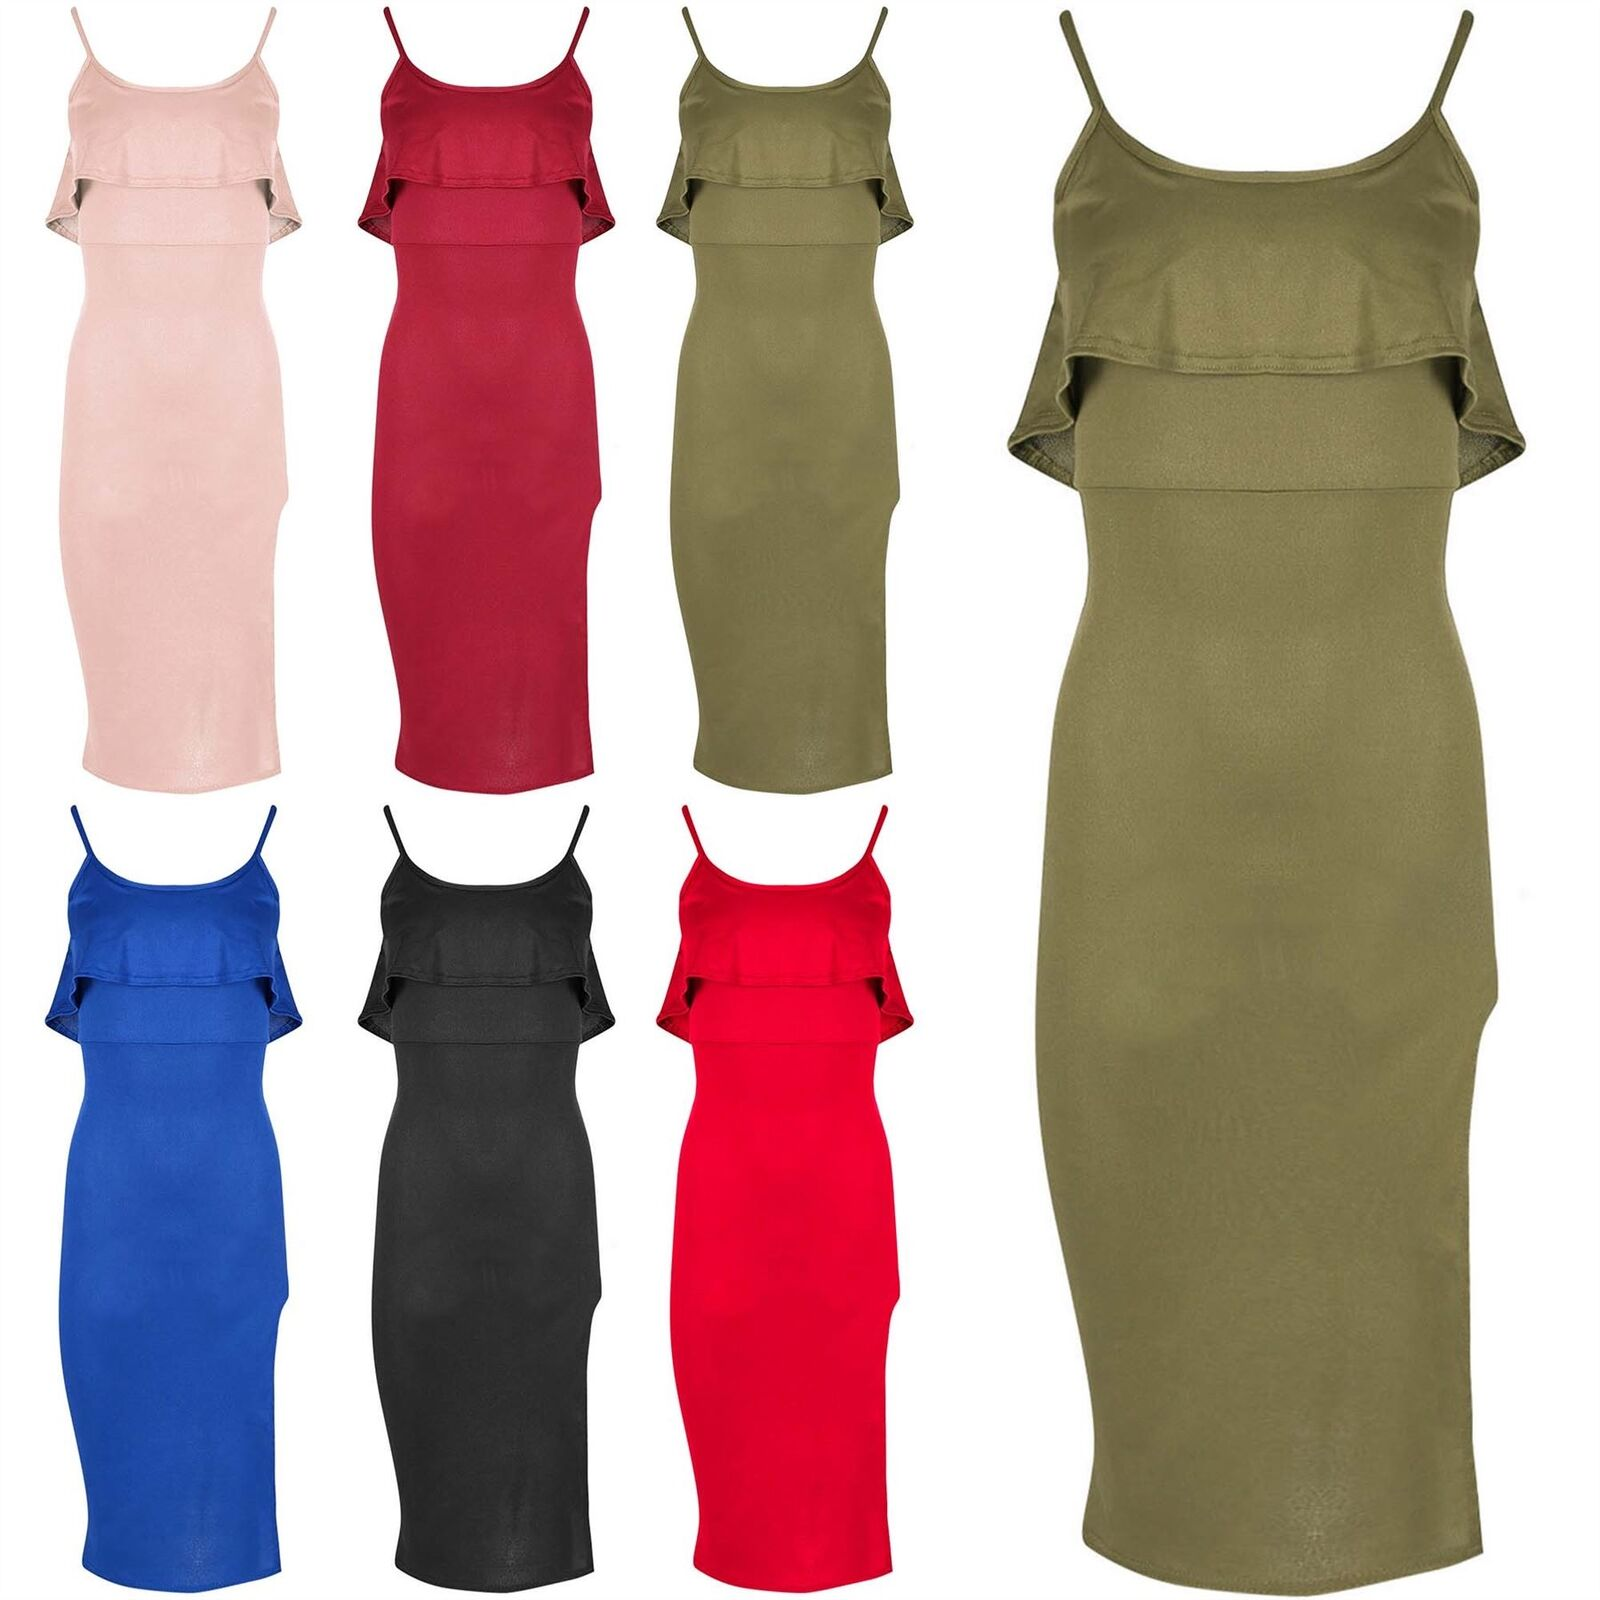 Femme Mince Cami Sangle Cami Mince Side Split Peplum Frill Bodycon Midi Bandage Dress 3def23